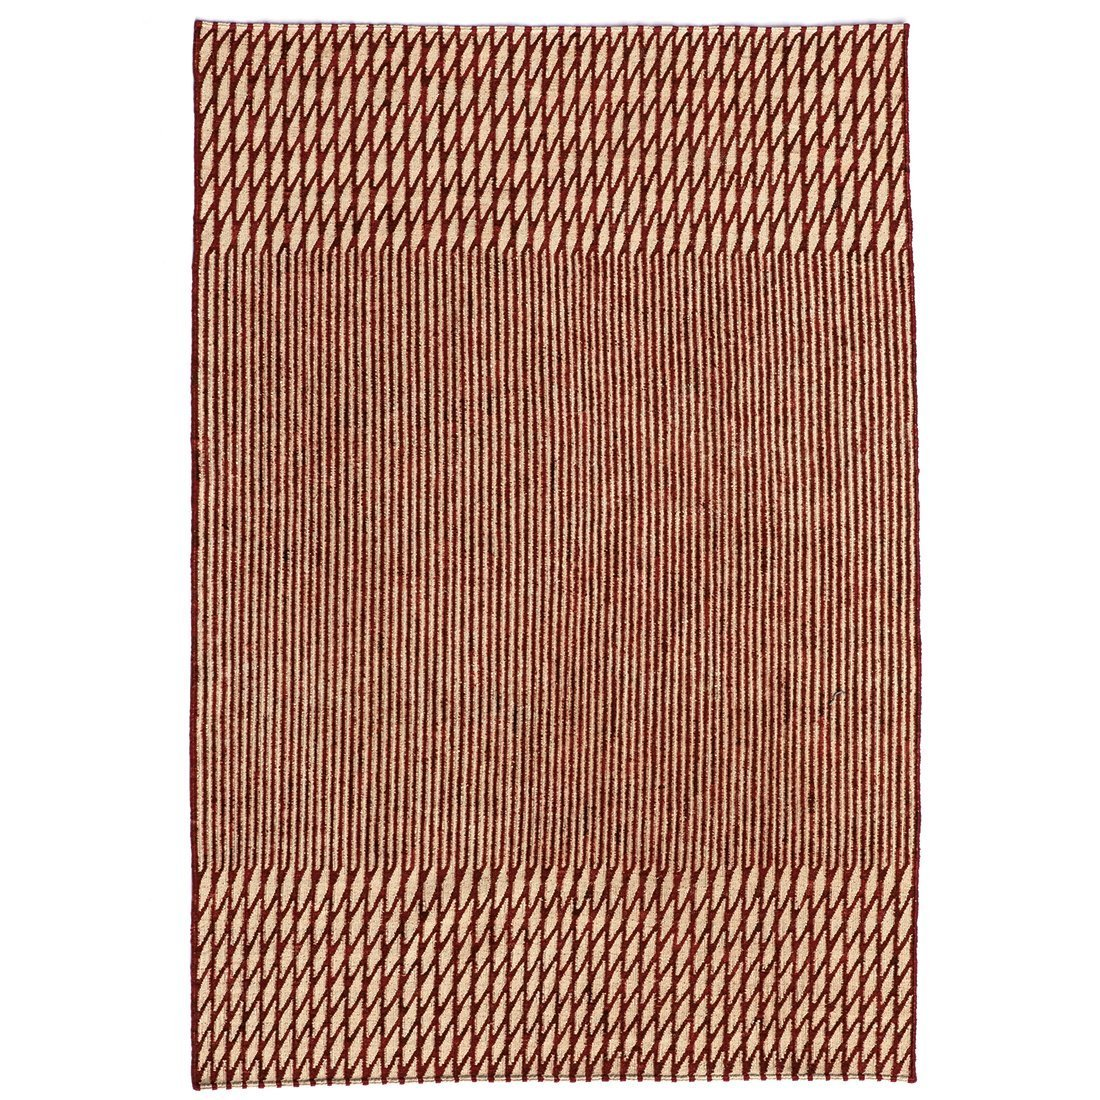 Nanimarquina Blur Vloerkleed Rood - 240 x 170 cm.